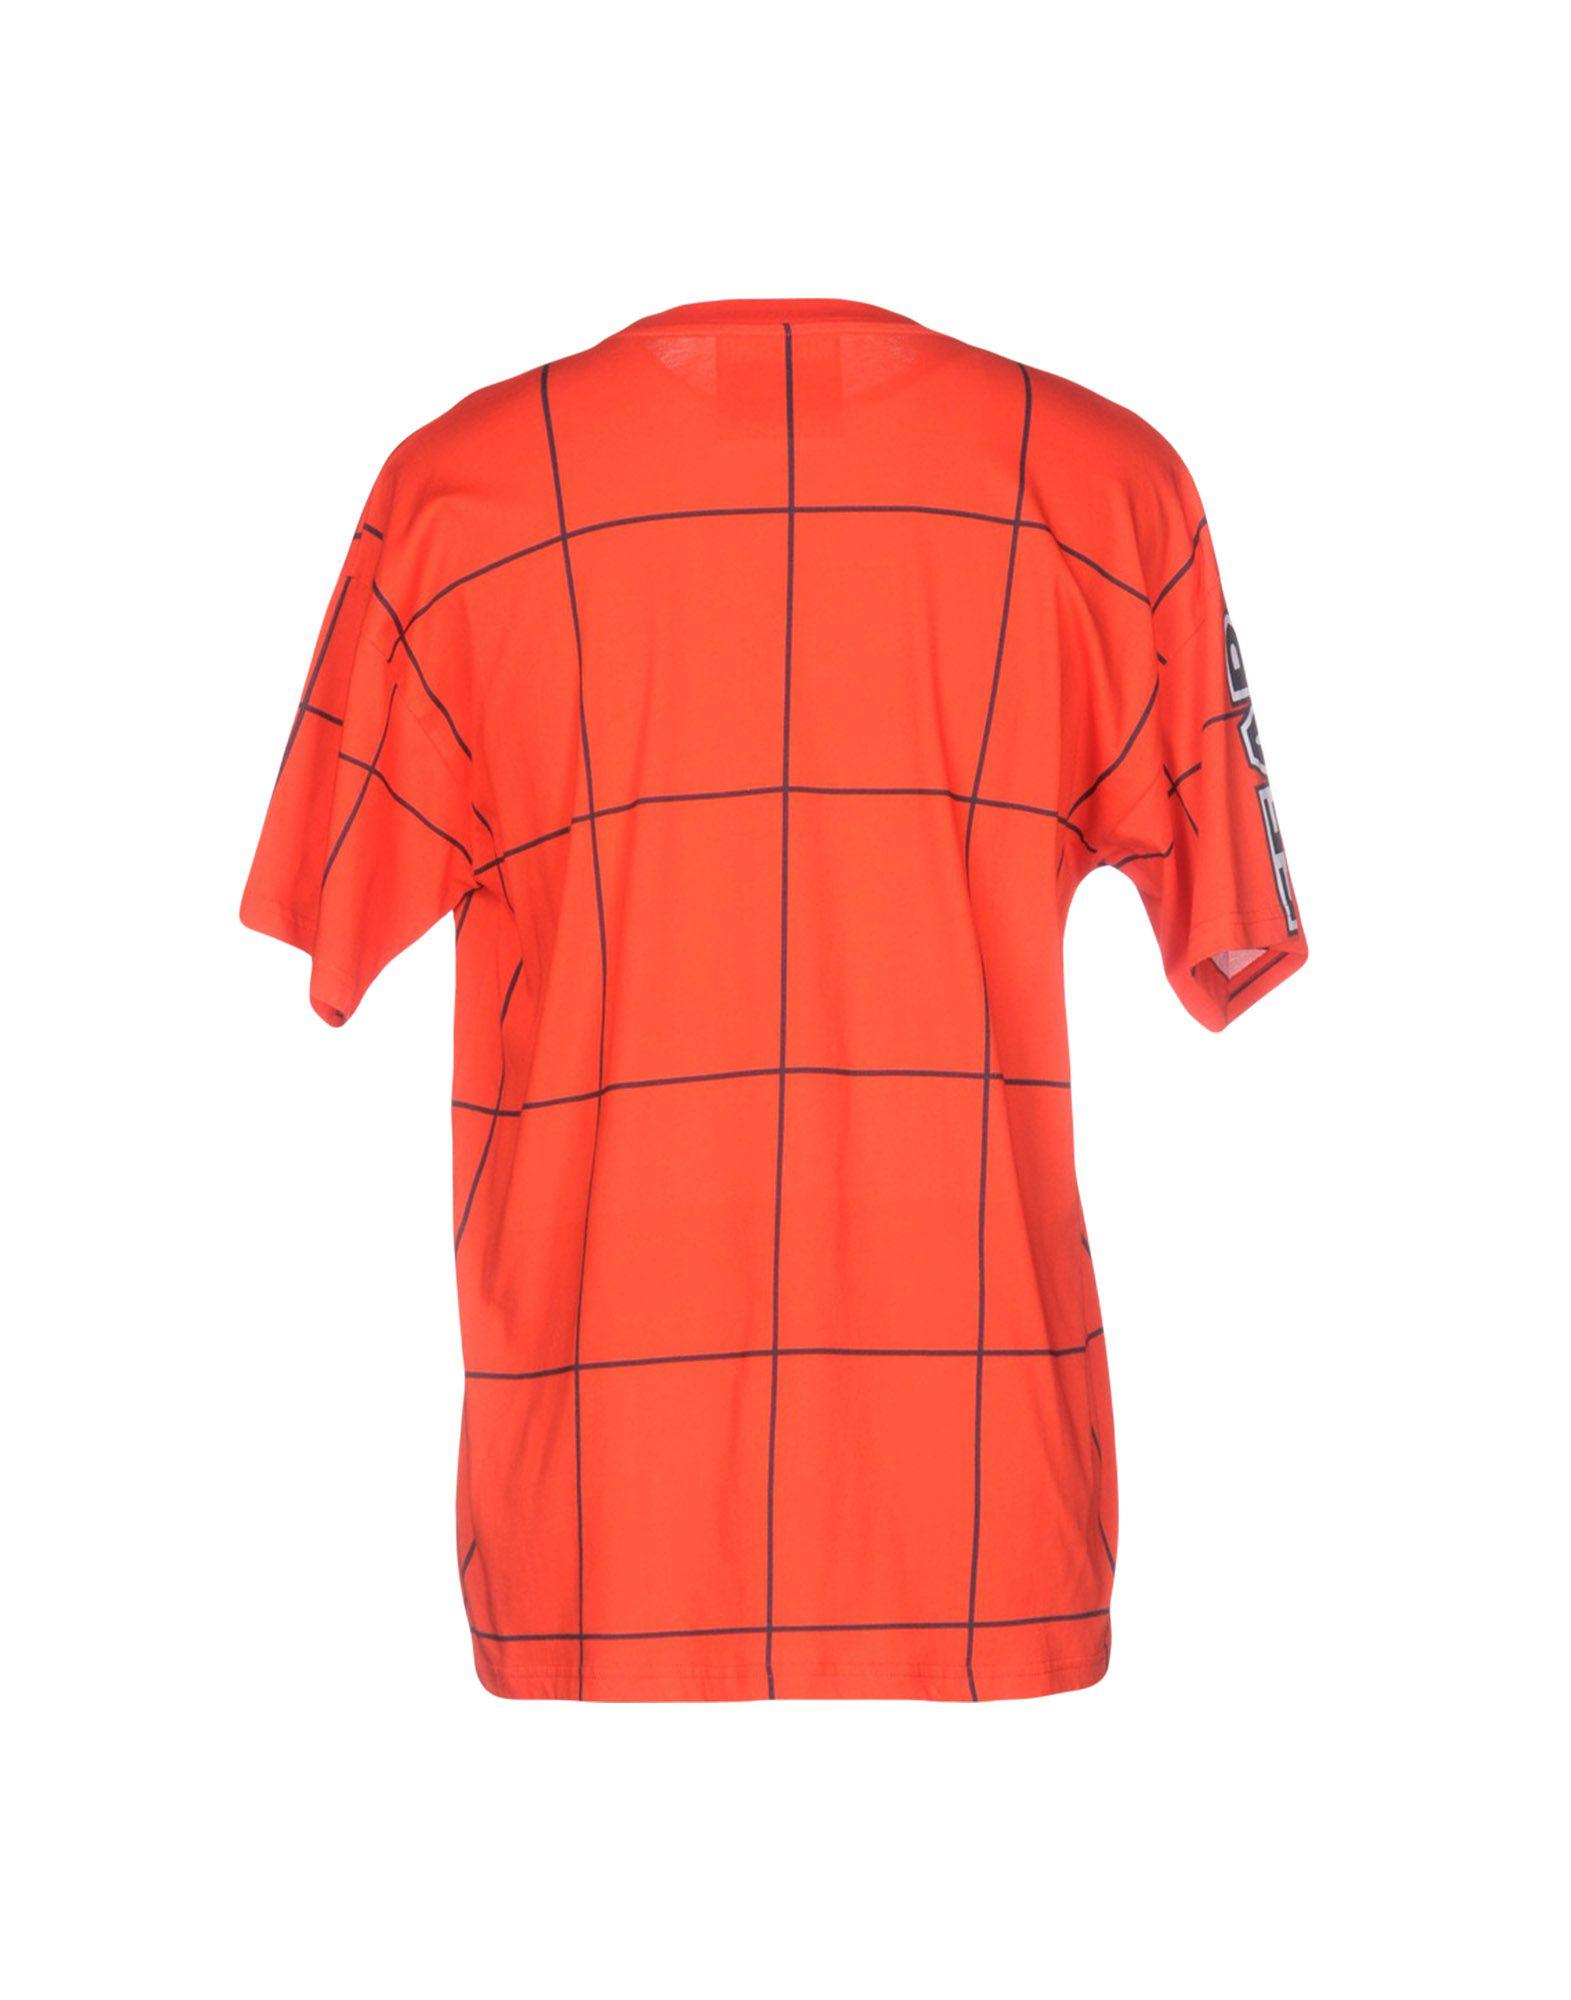 A Uomo buon mercato A buon mercato T-Shirt Moschino Uomo A - 12027013FF e40536